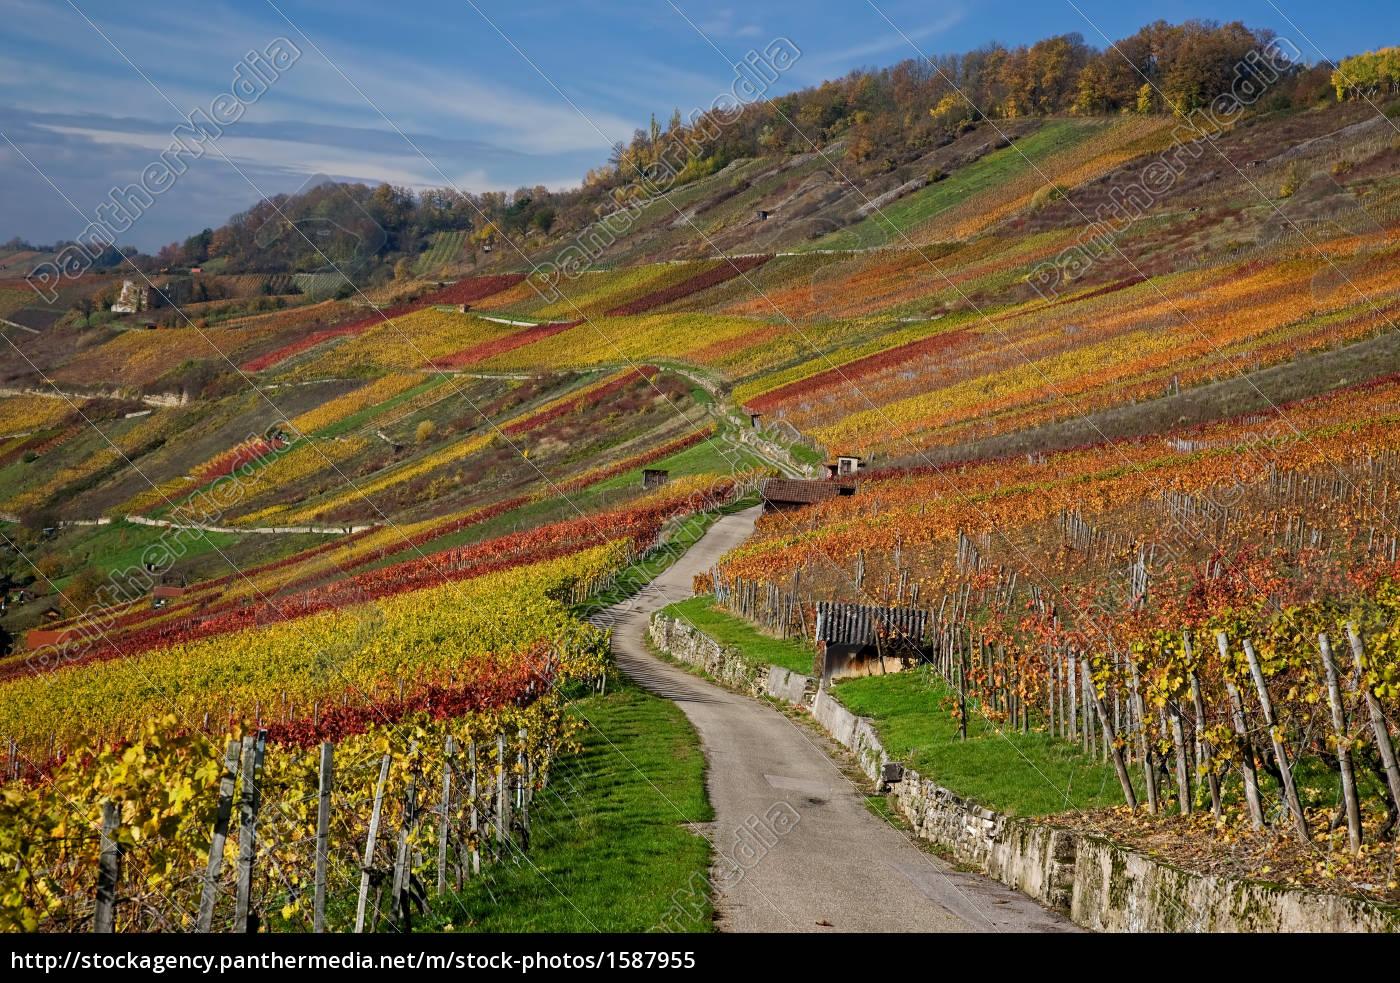 autumnal, vineyard - 1587955